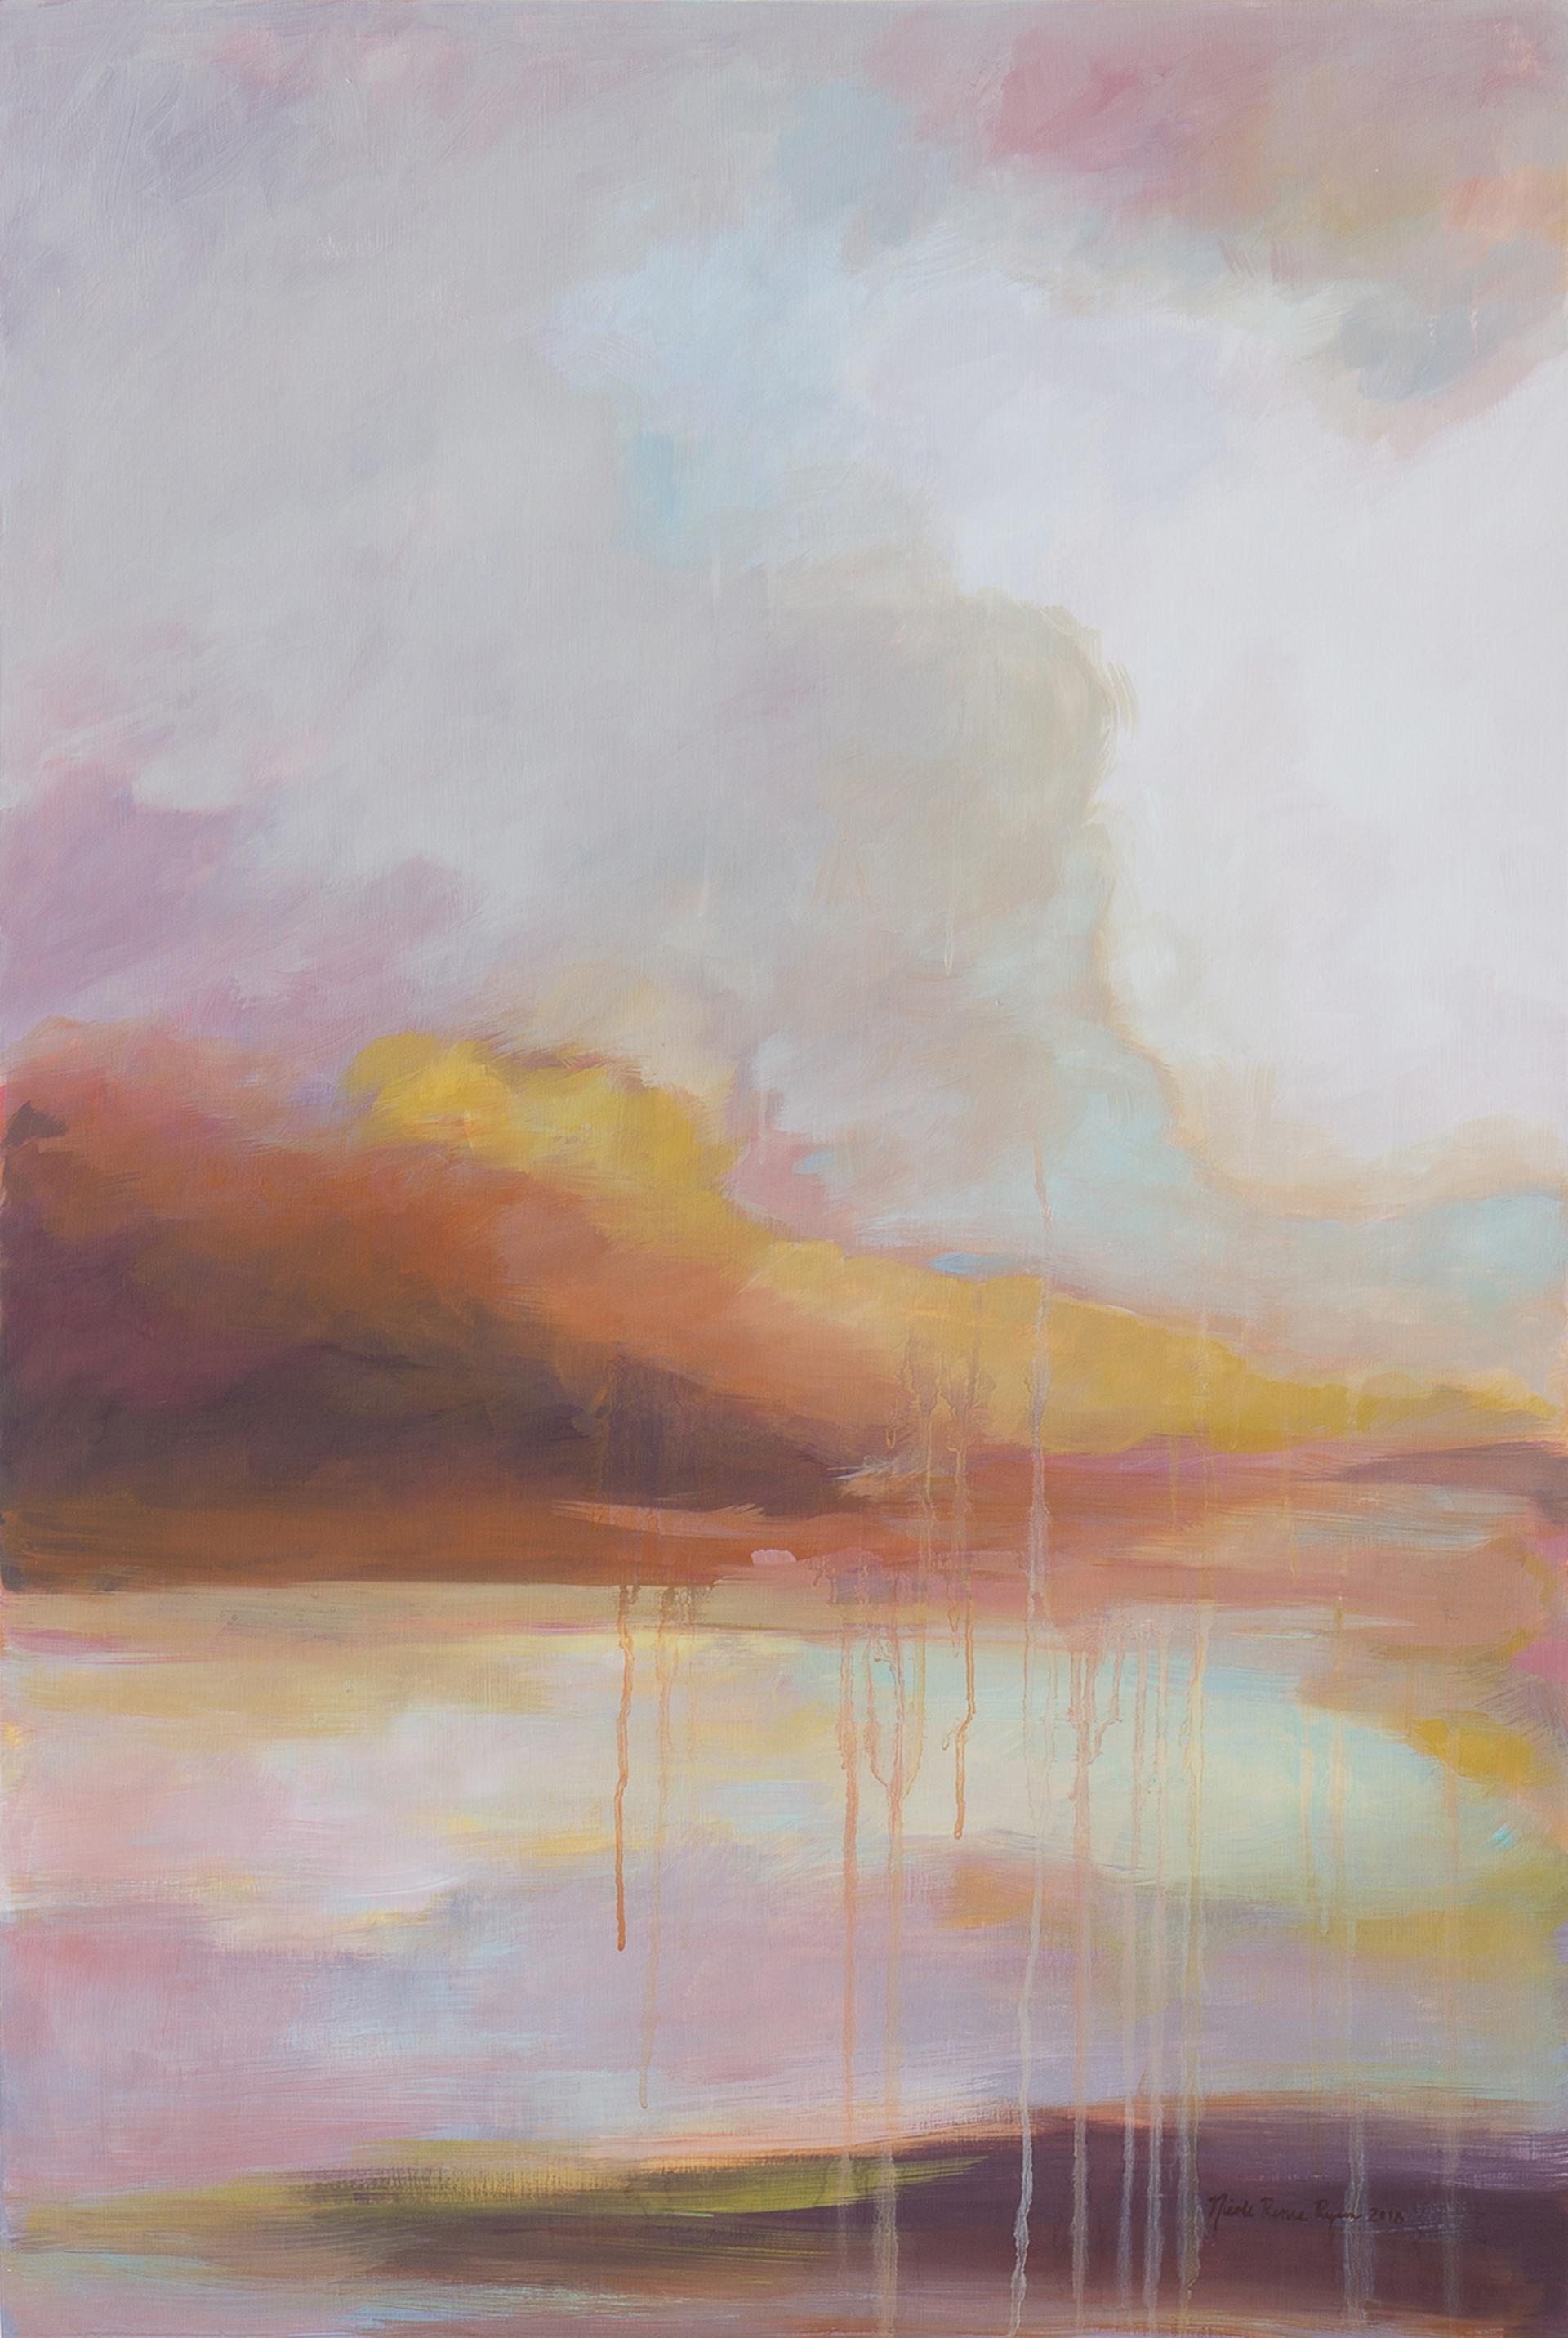 The Murmur in the Air, Go Nowhere by Nicole Renee Ryan